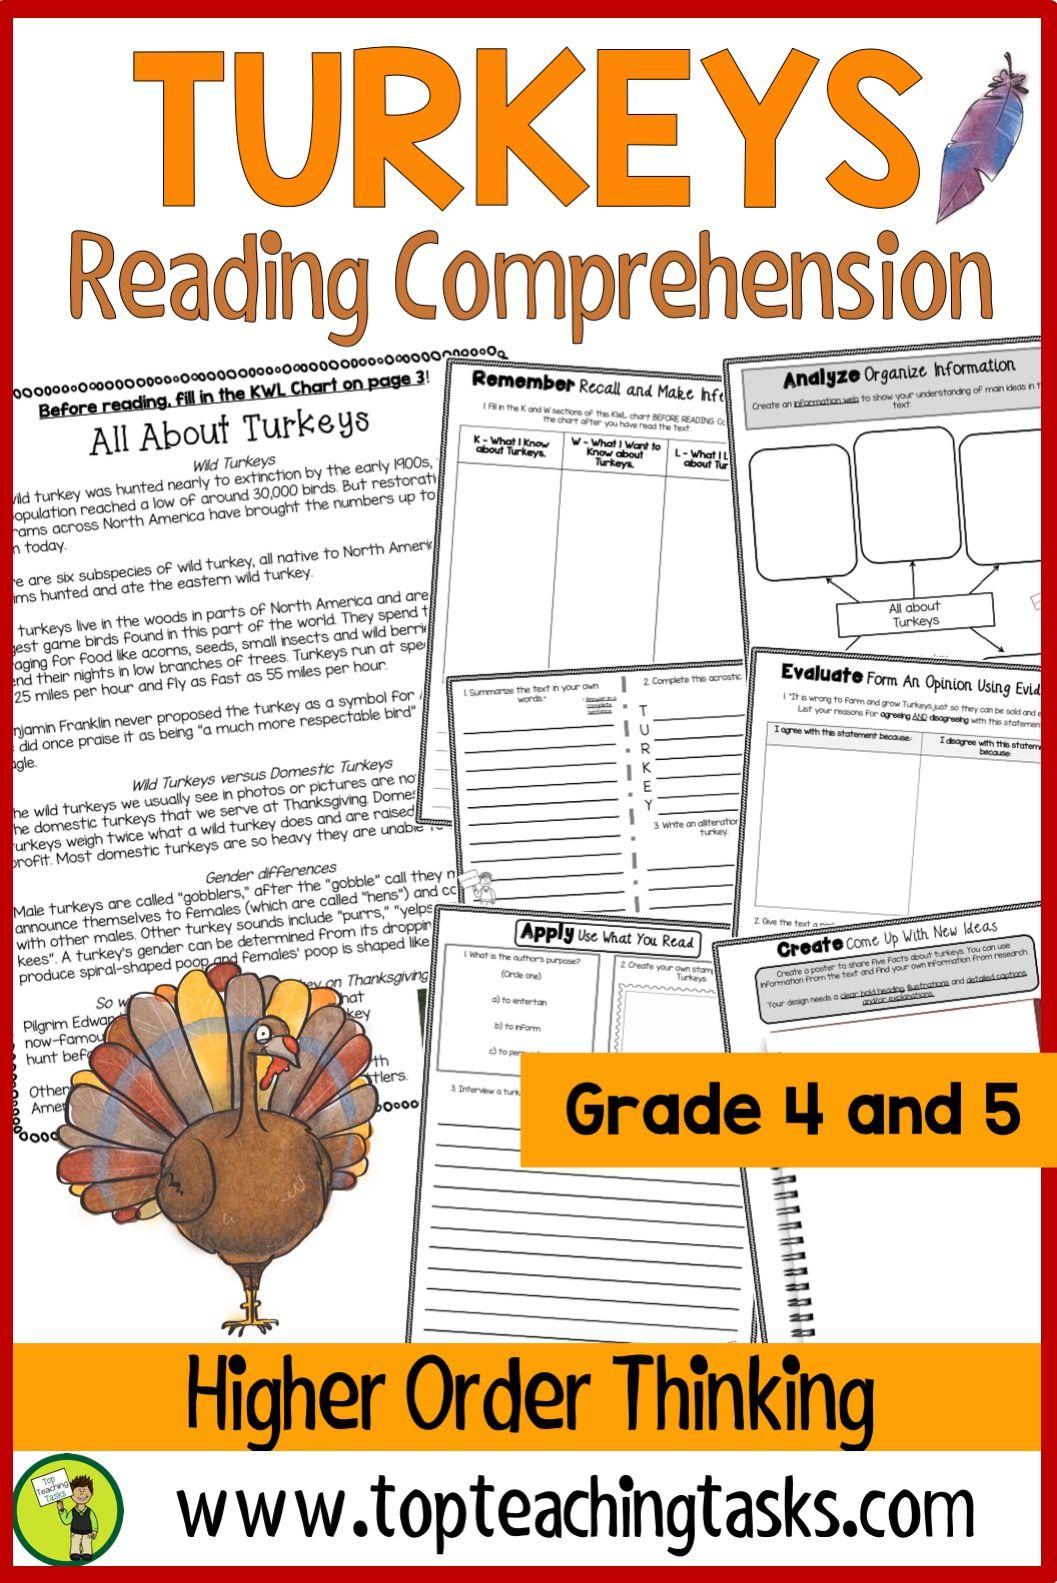 Turkeys Reading Comprehension Reading Comprehension Reading Comprehension Passages Comprehension Passage [ 1583 x 1057 Pixel ]